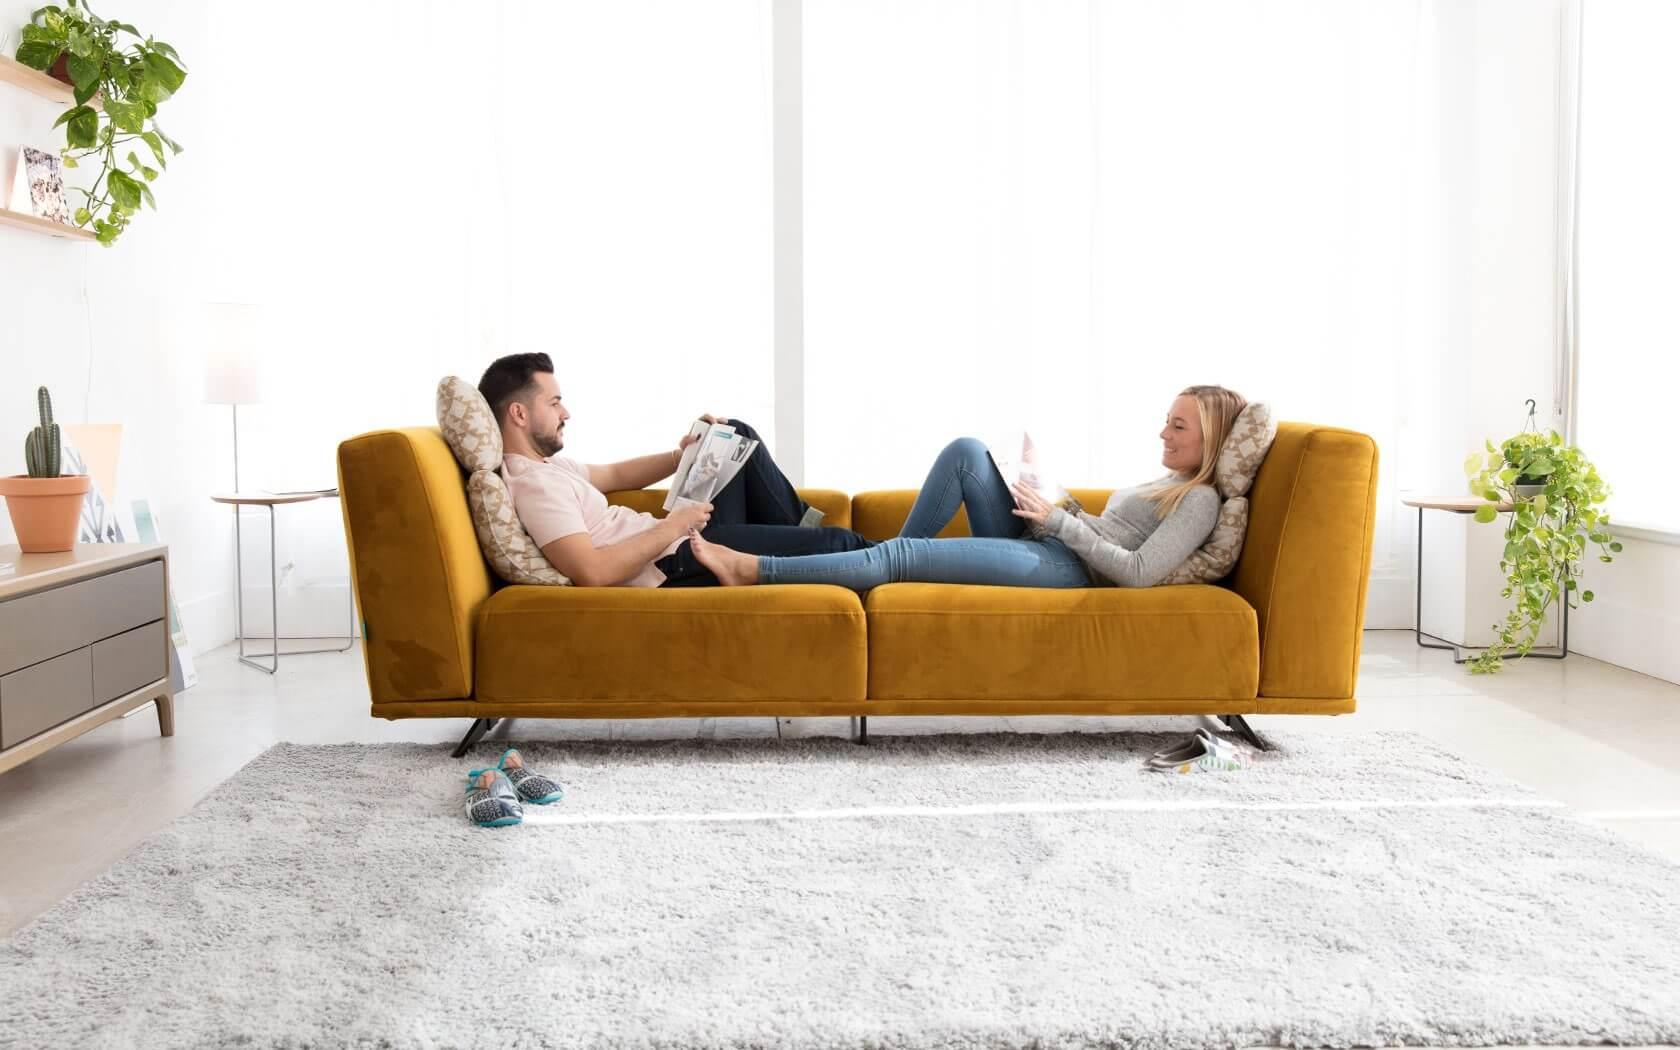 sofa-famasofas-klee-2020-stiegler-wohnku